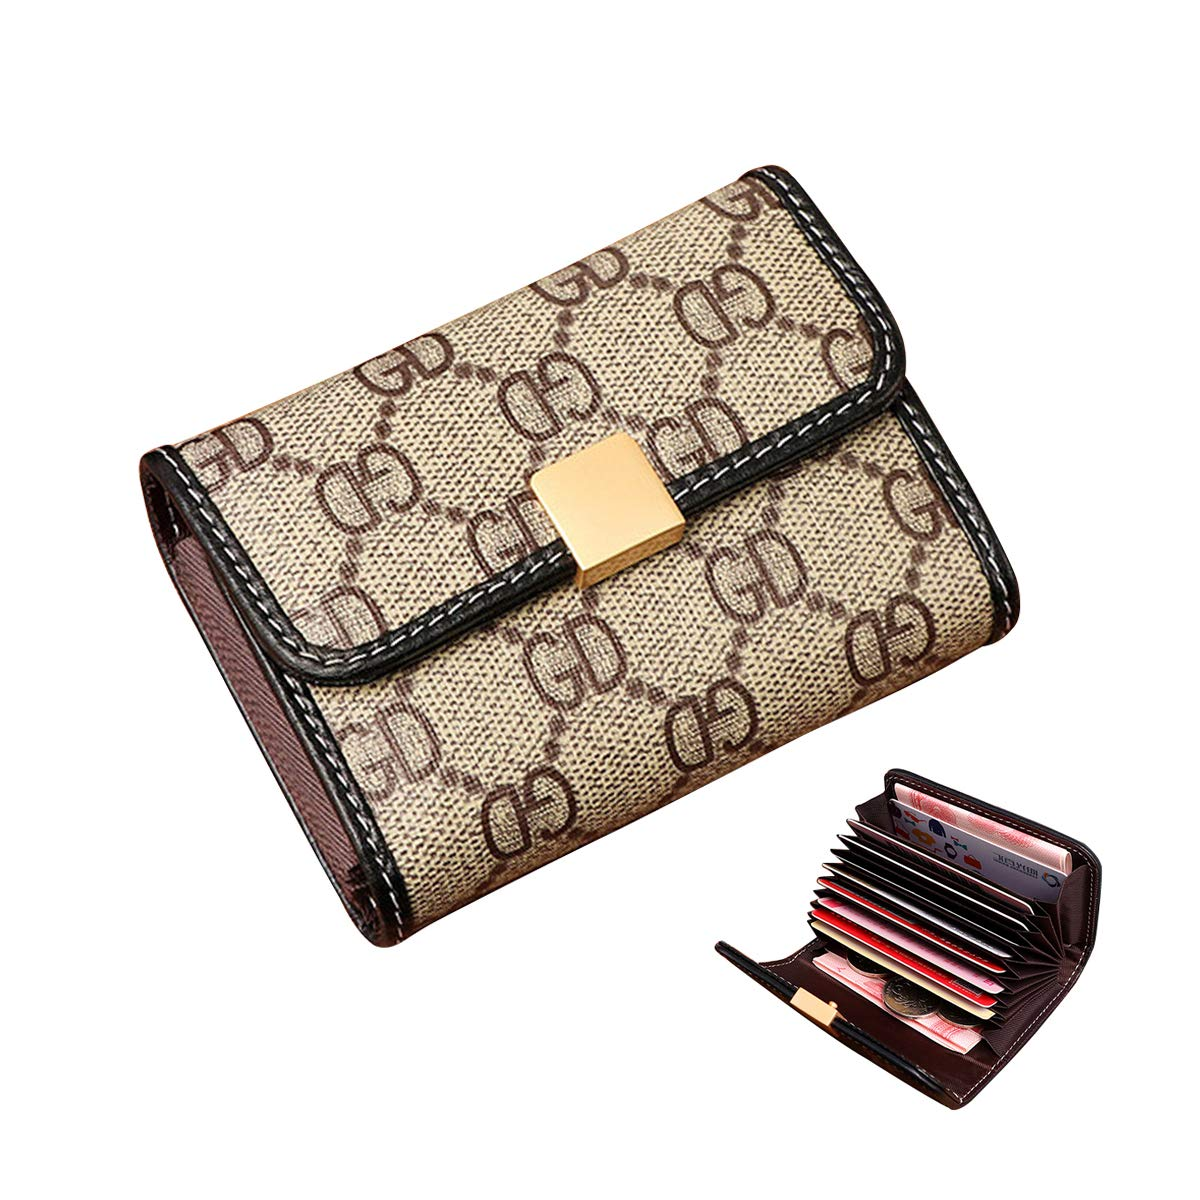 Women Designer Wallet Rfid Blocking Credit Card Holder Wallets Pu Leather Small Accordion Ladies Purse - Beige